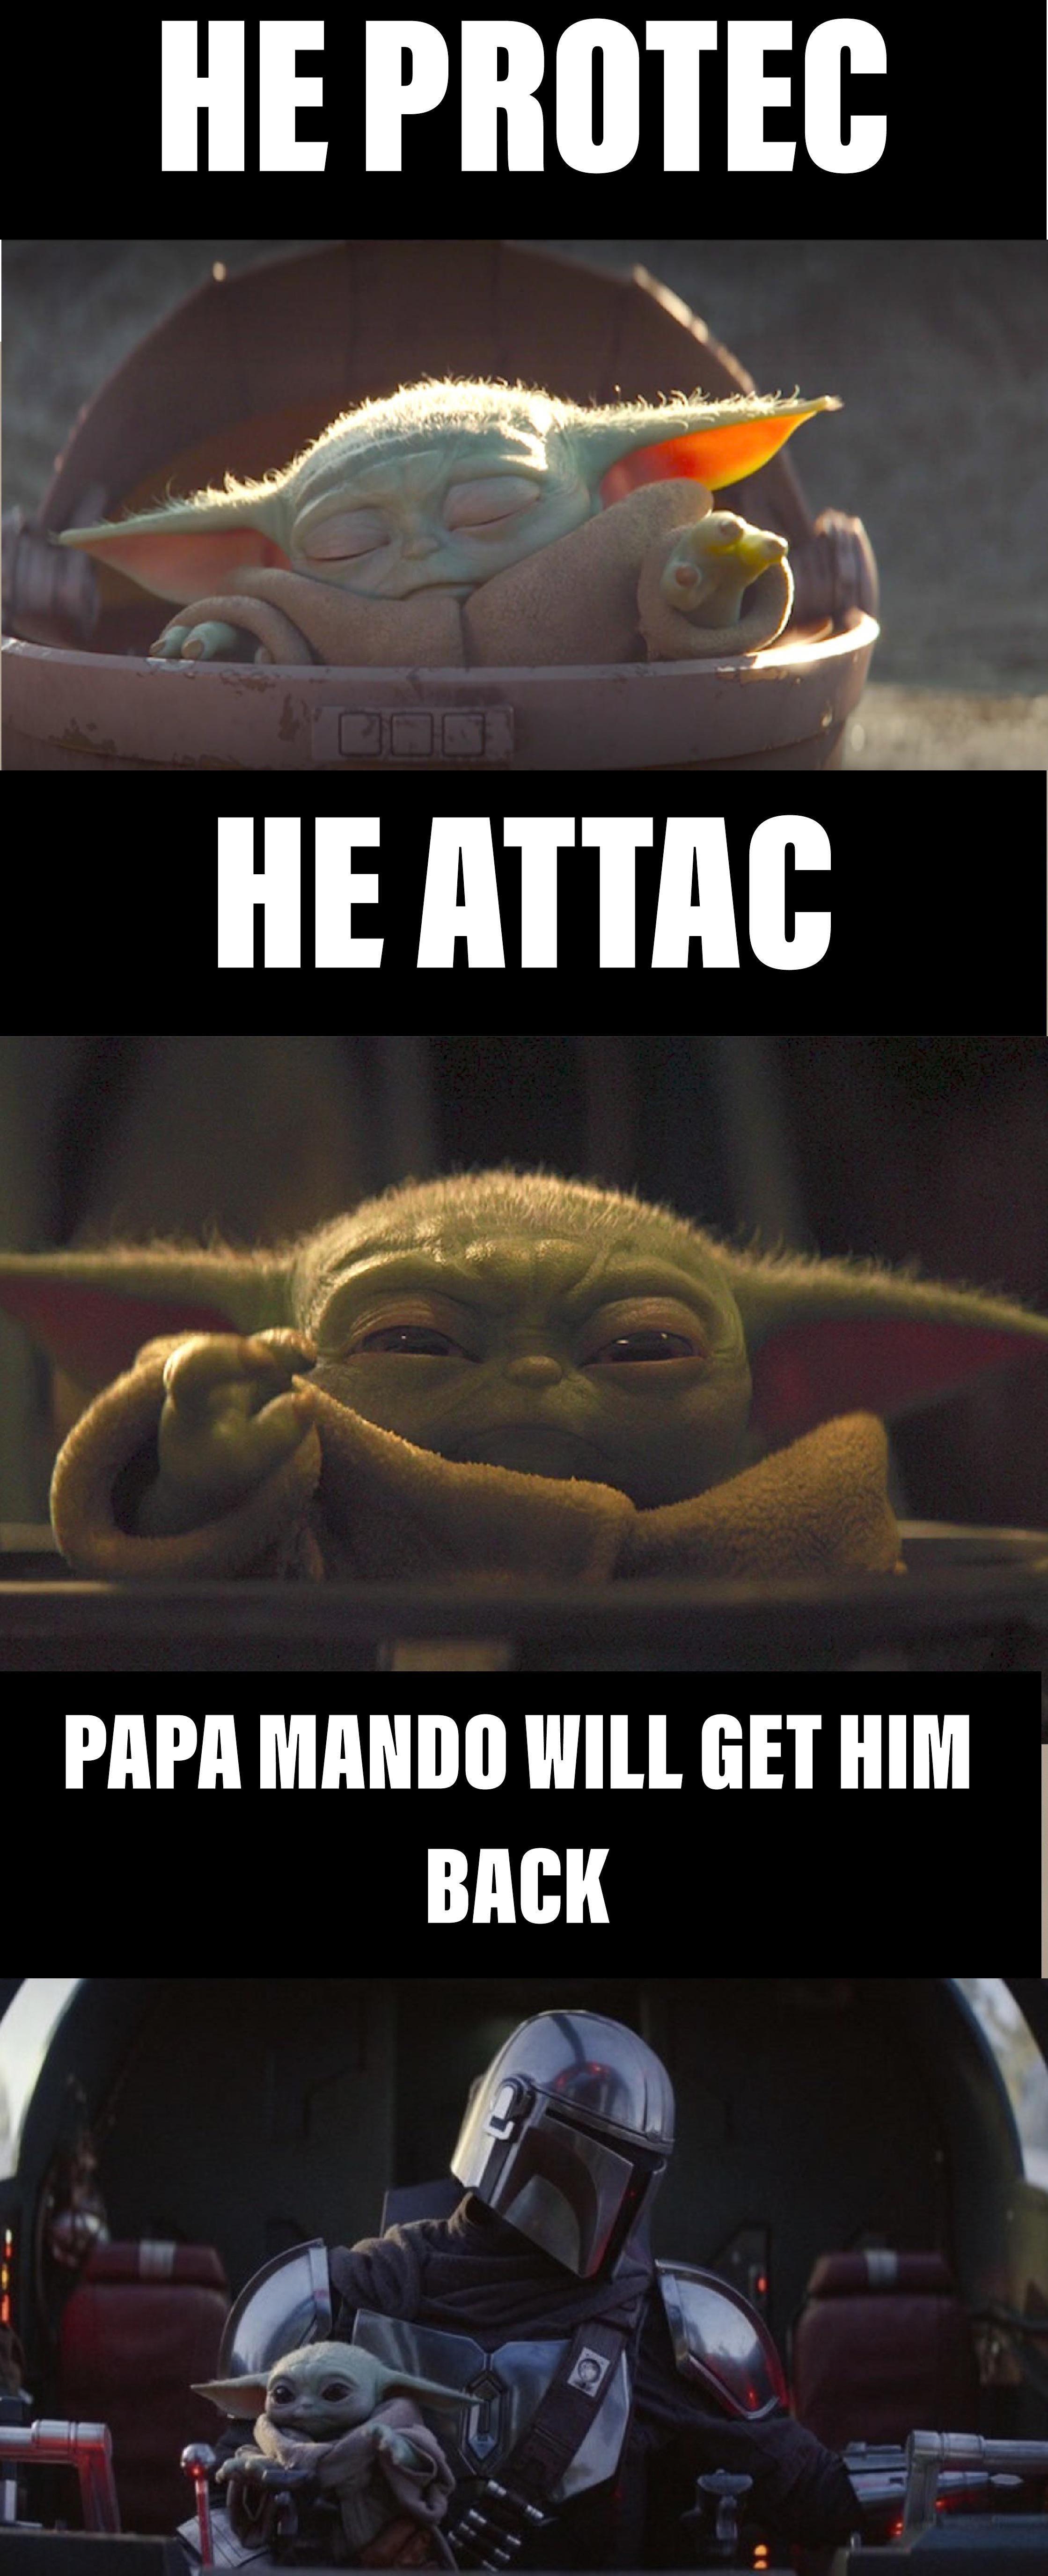 Pin By Marly Nunes On Ways Of The Force Yoda Funny Yoda Meme Funny Baby Memes